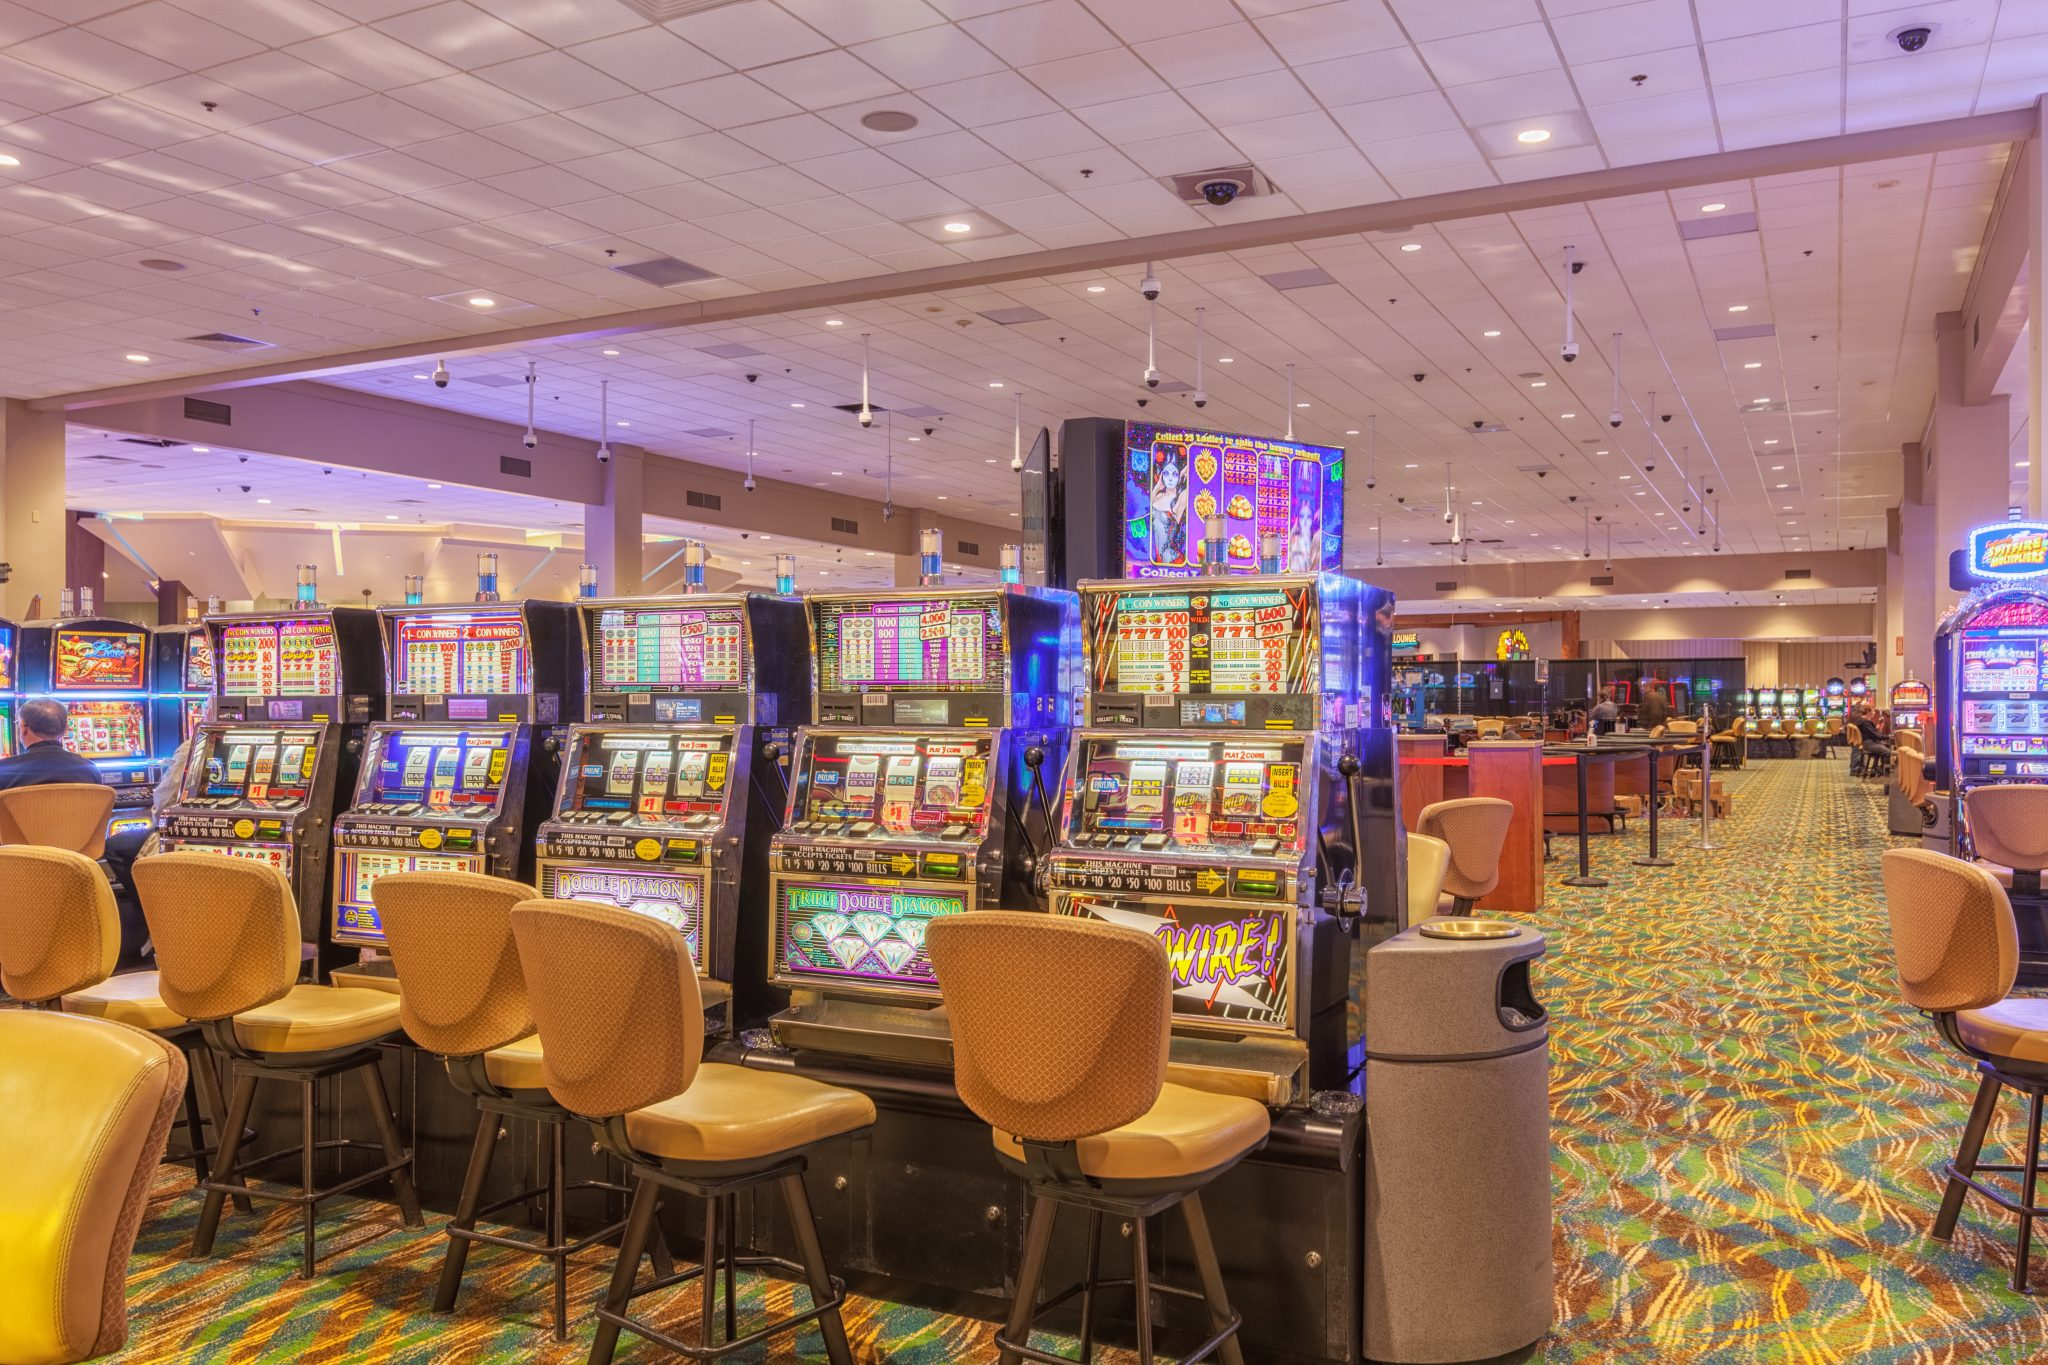 Hotels Near Little River Casino Manistee Michigan